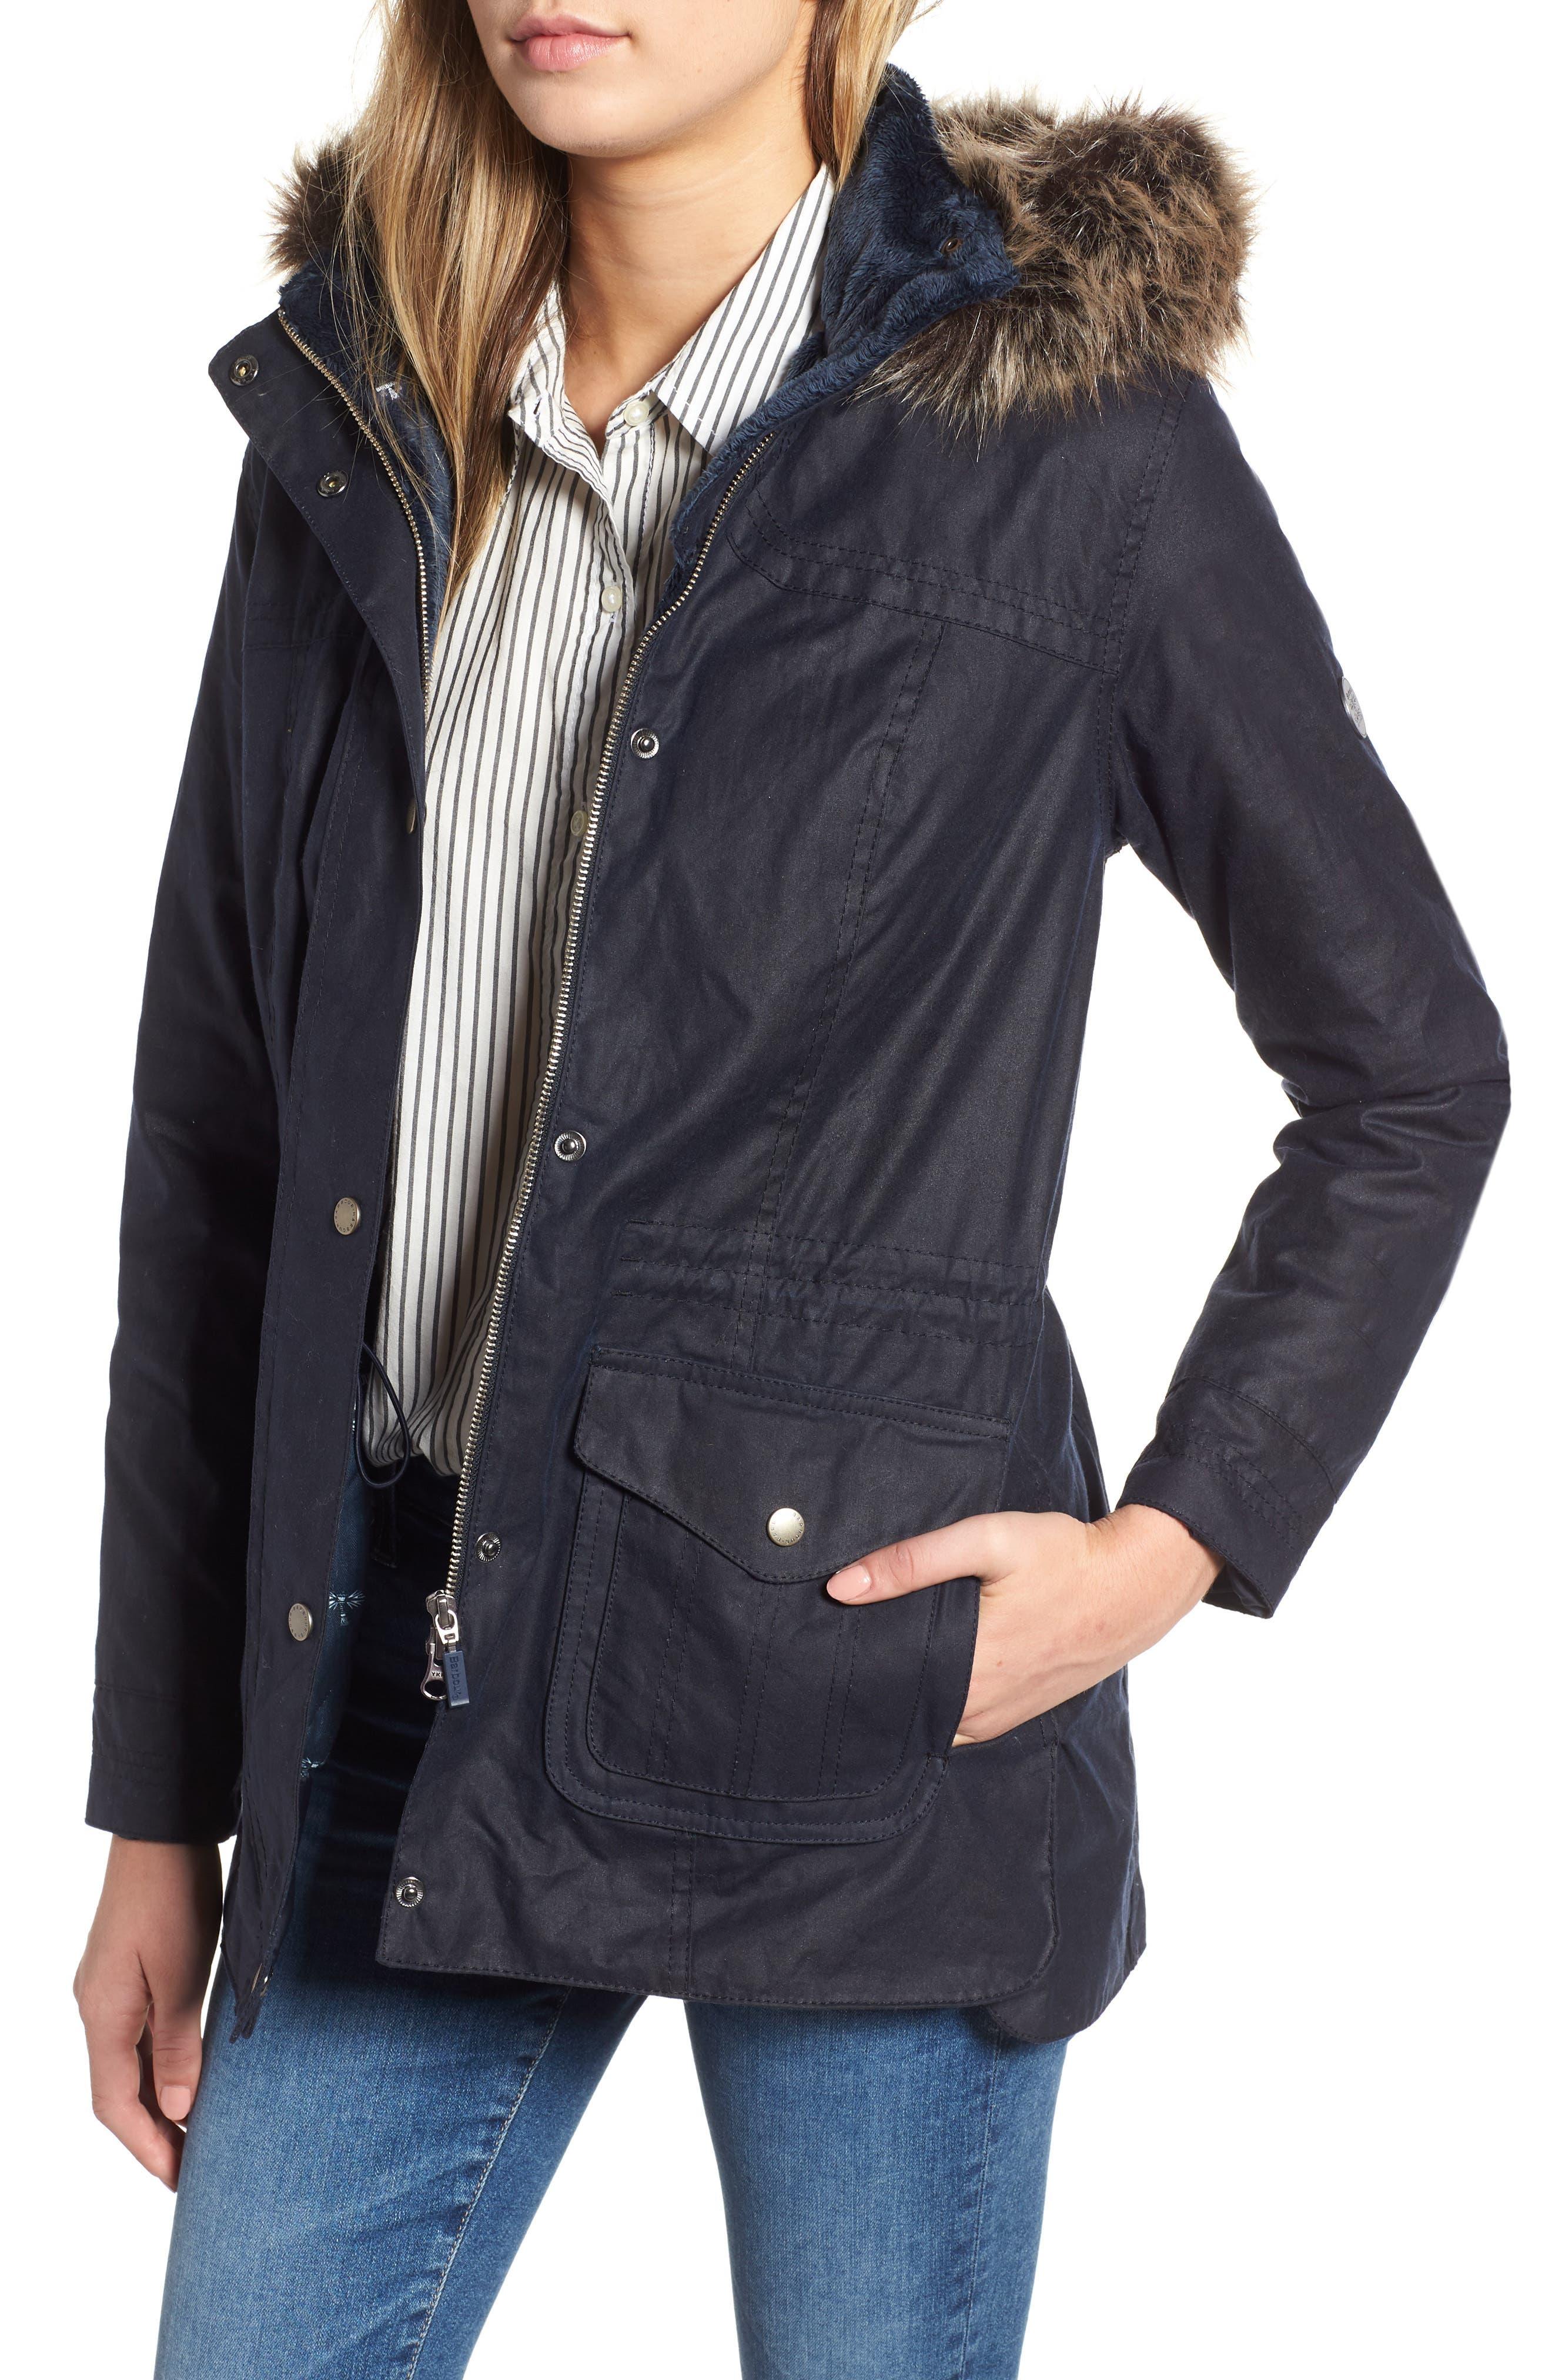 Barbour Southwold Jacket With Faux Fur Lining & Trim, US / 8 UK - Blue